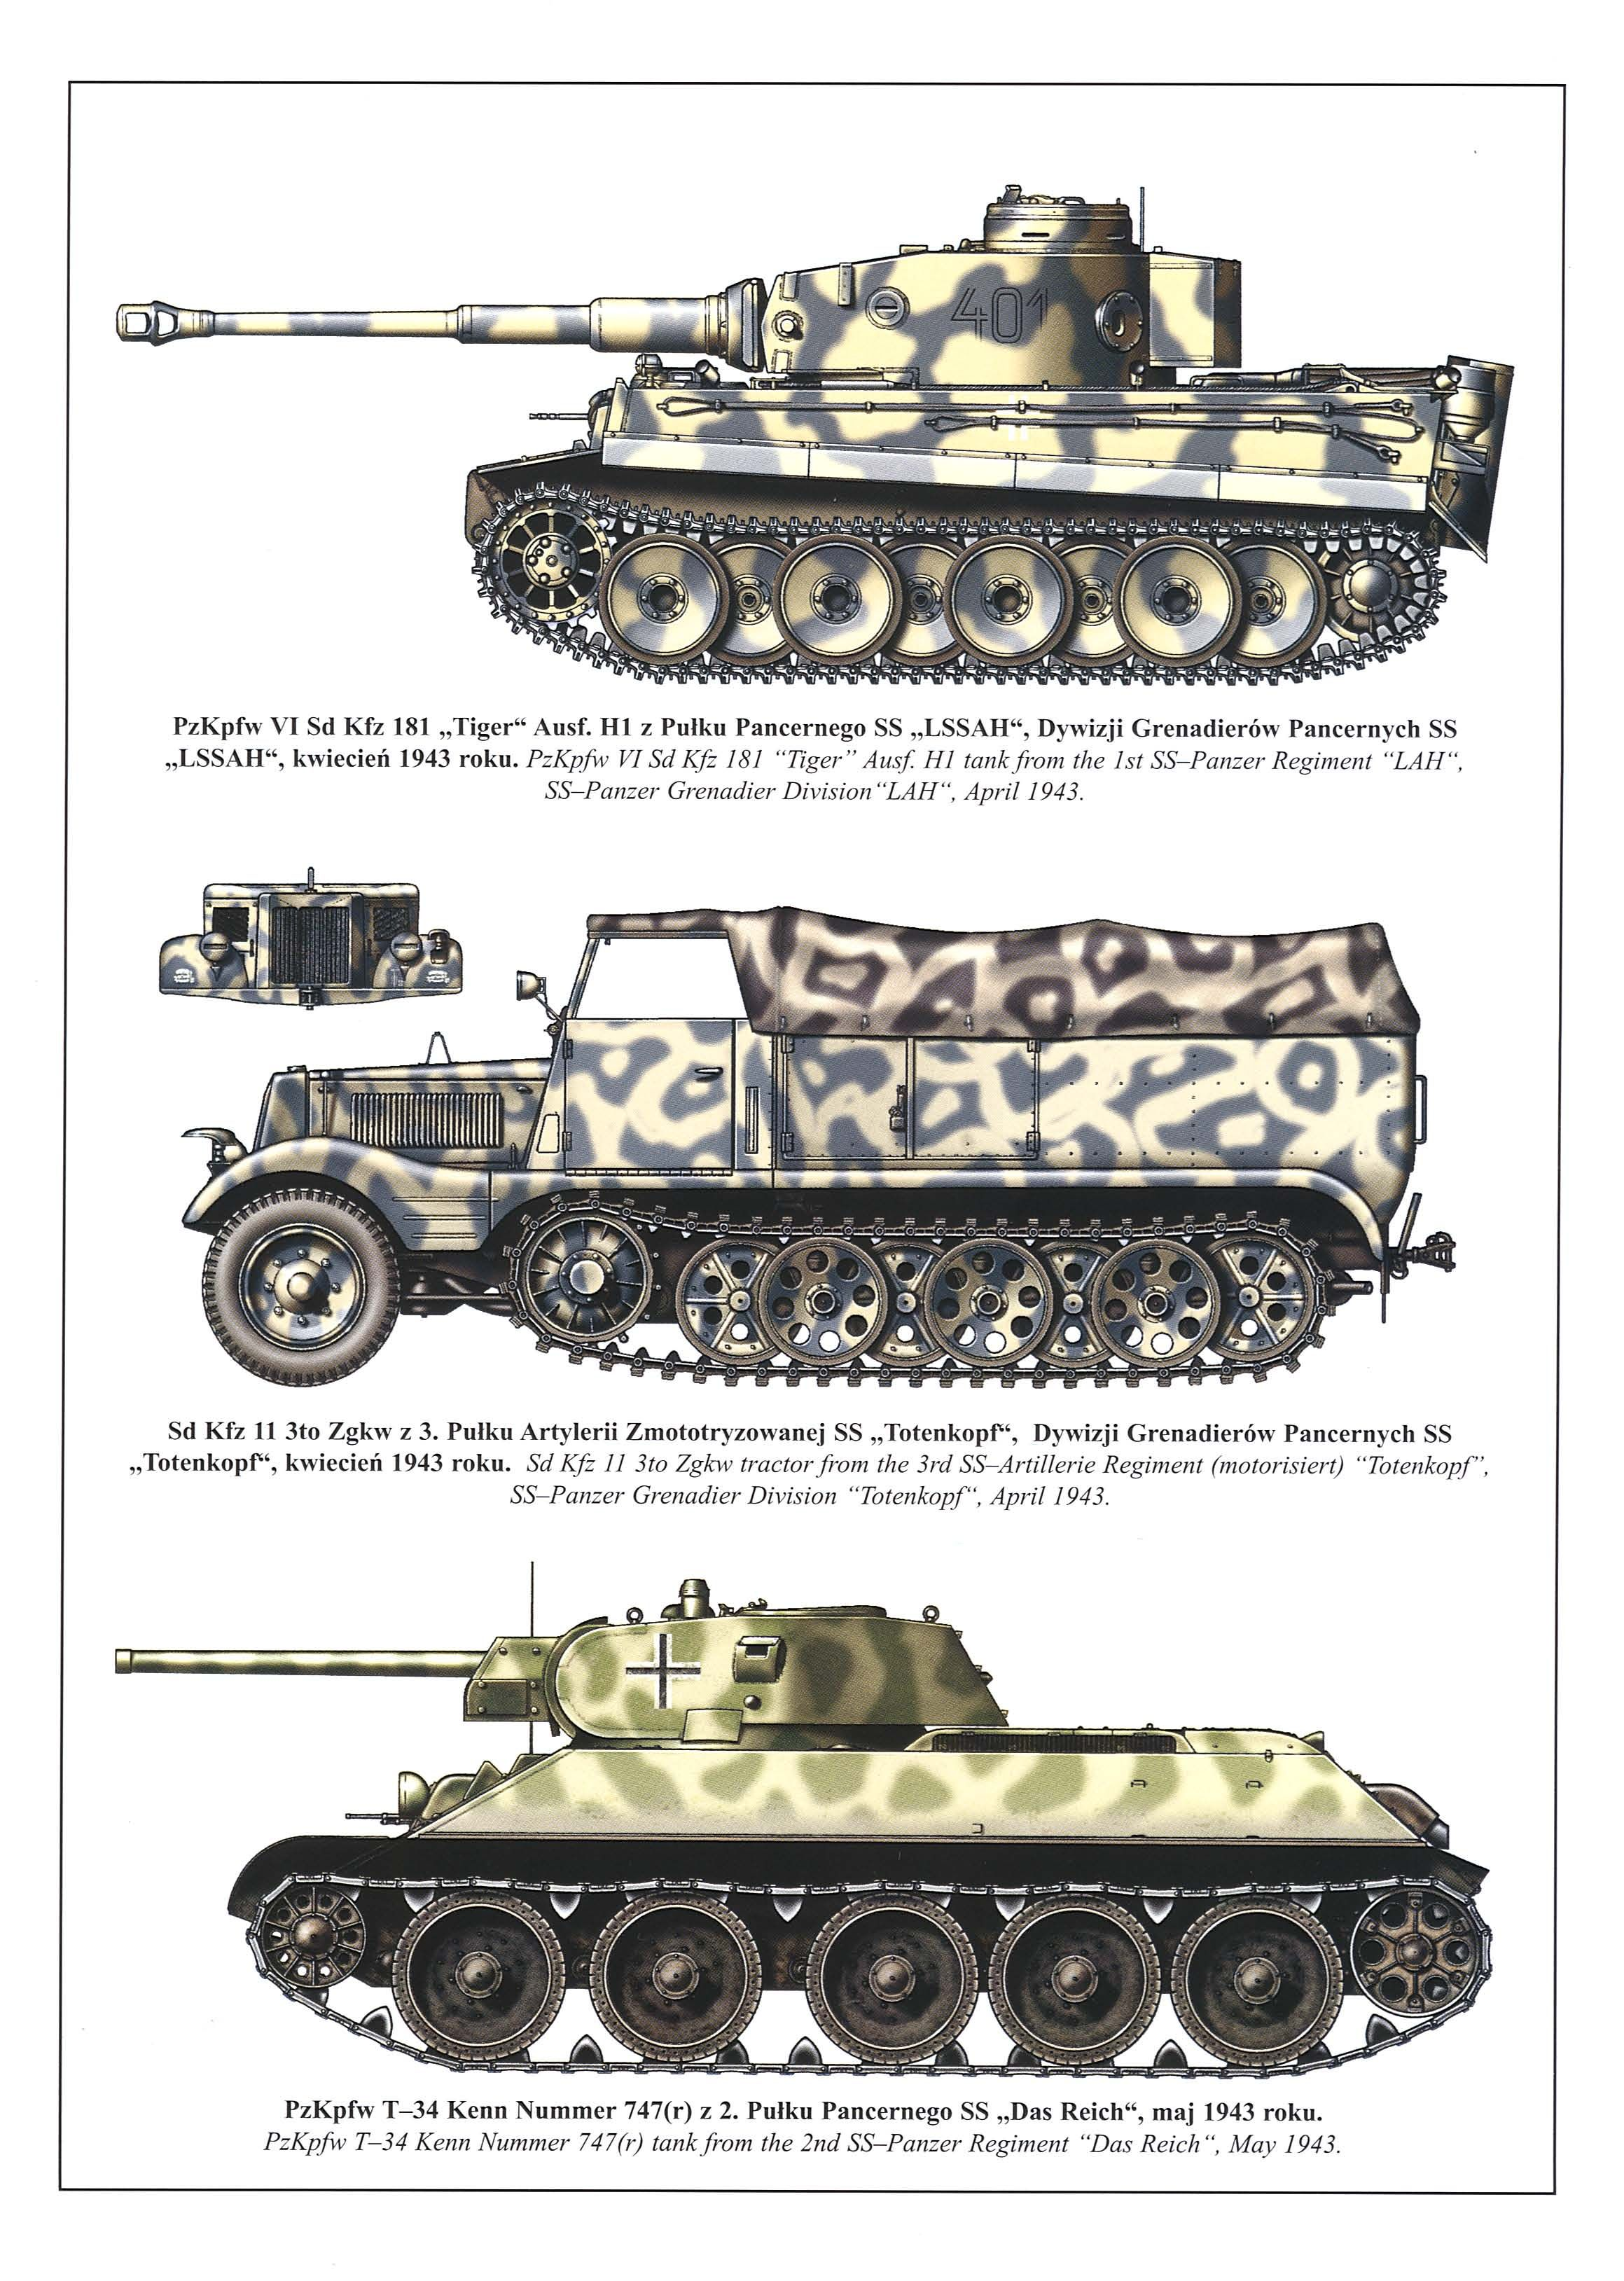 Pin by Harris Ustav on Miliitary on land | Military vehicles